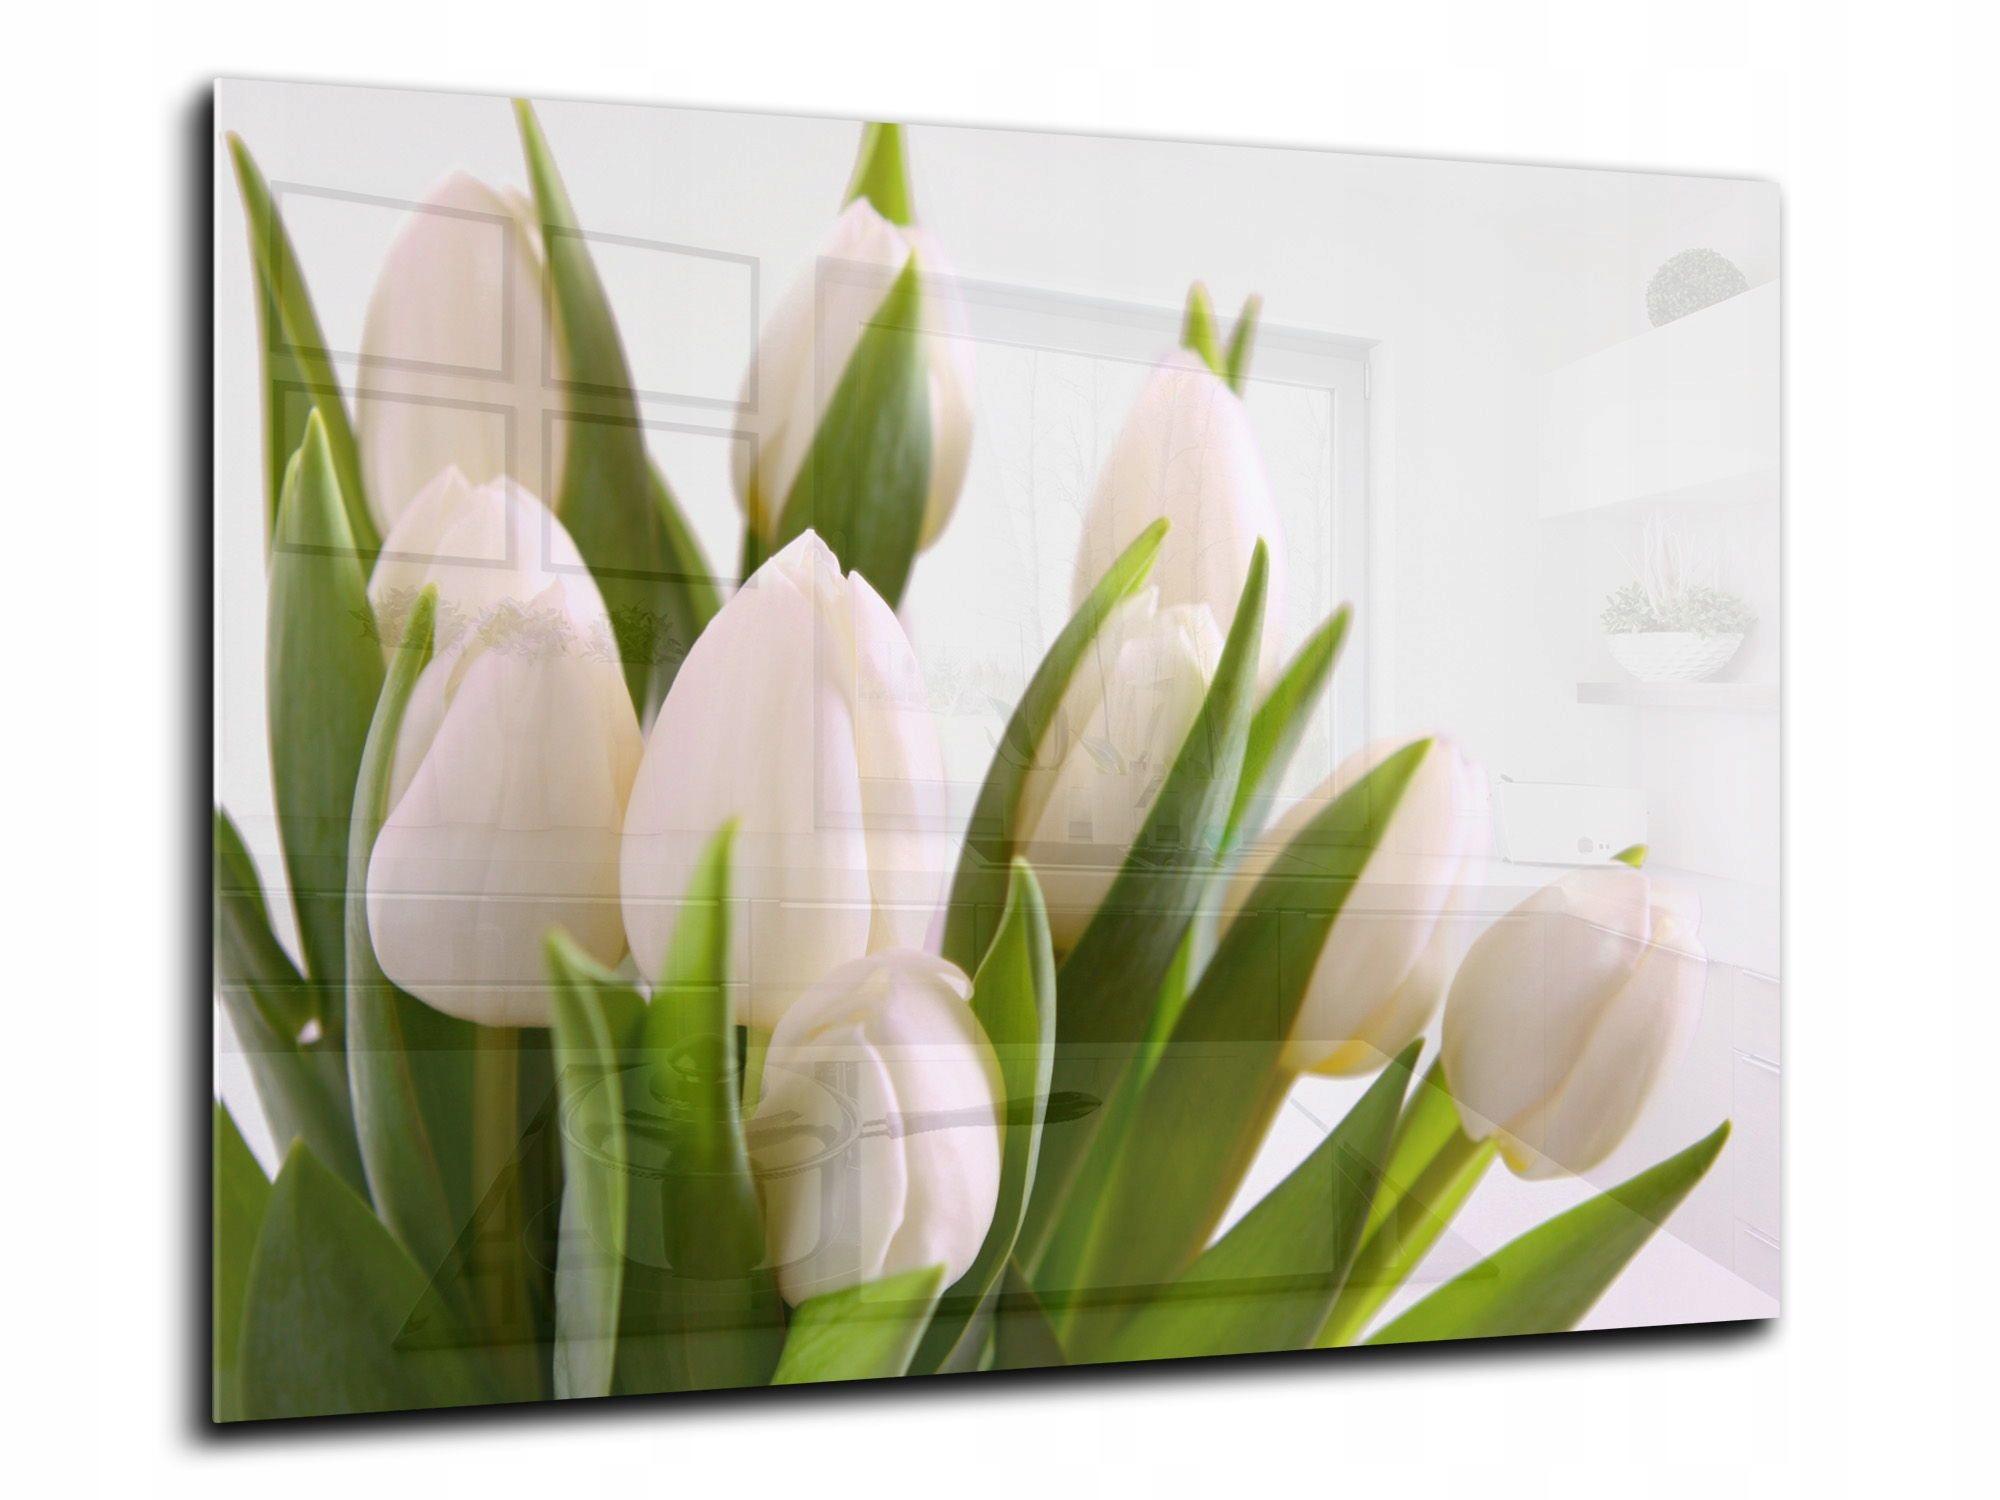 bar medzi kuchynský nábytok 100x70 Tulipán